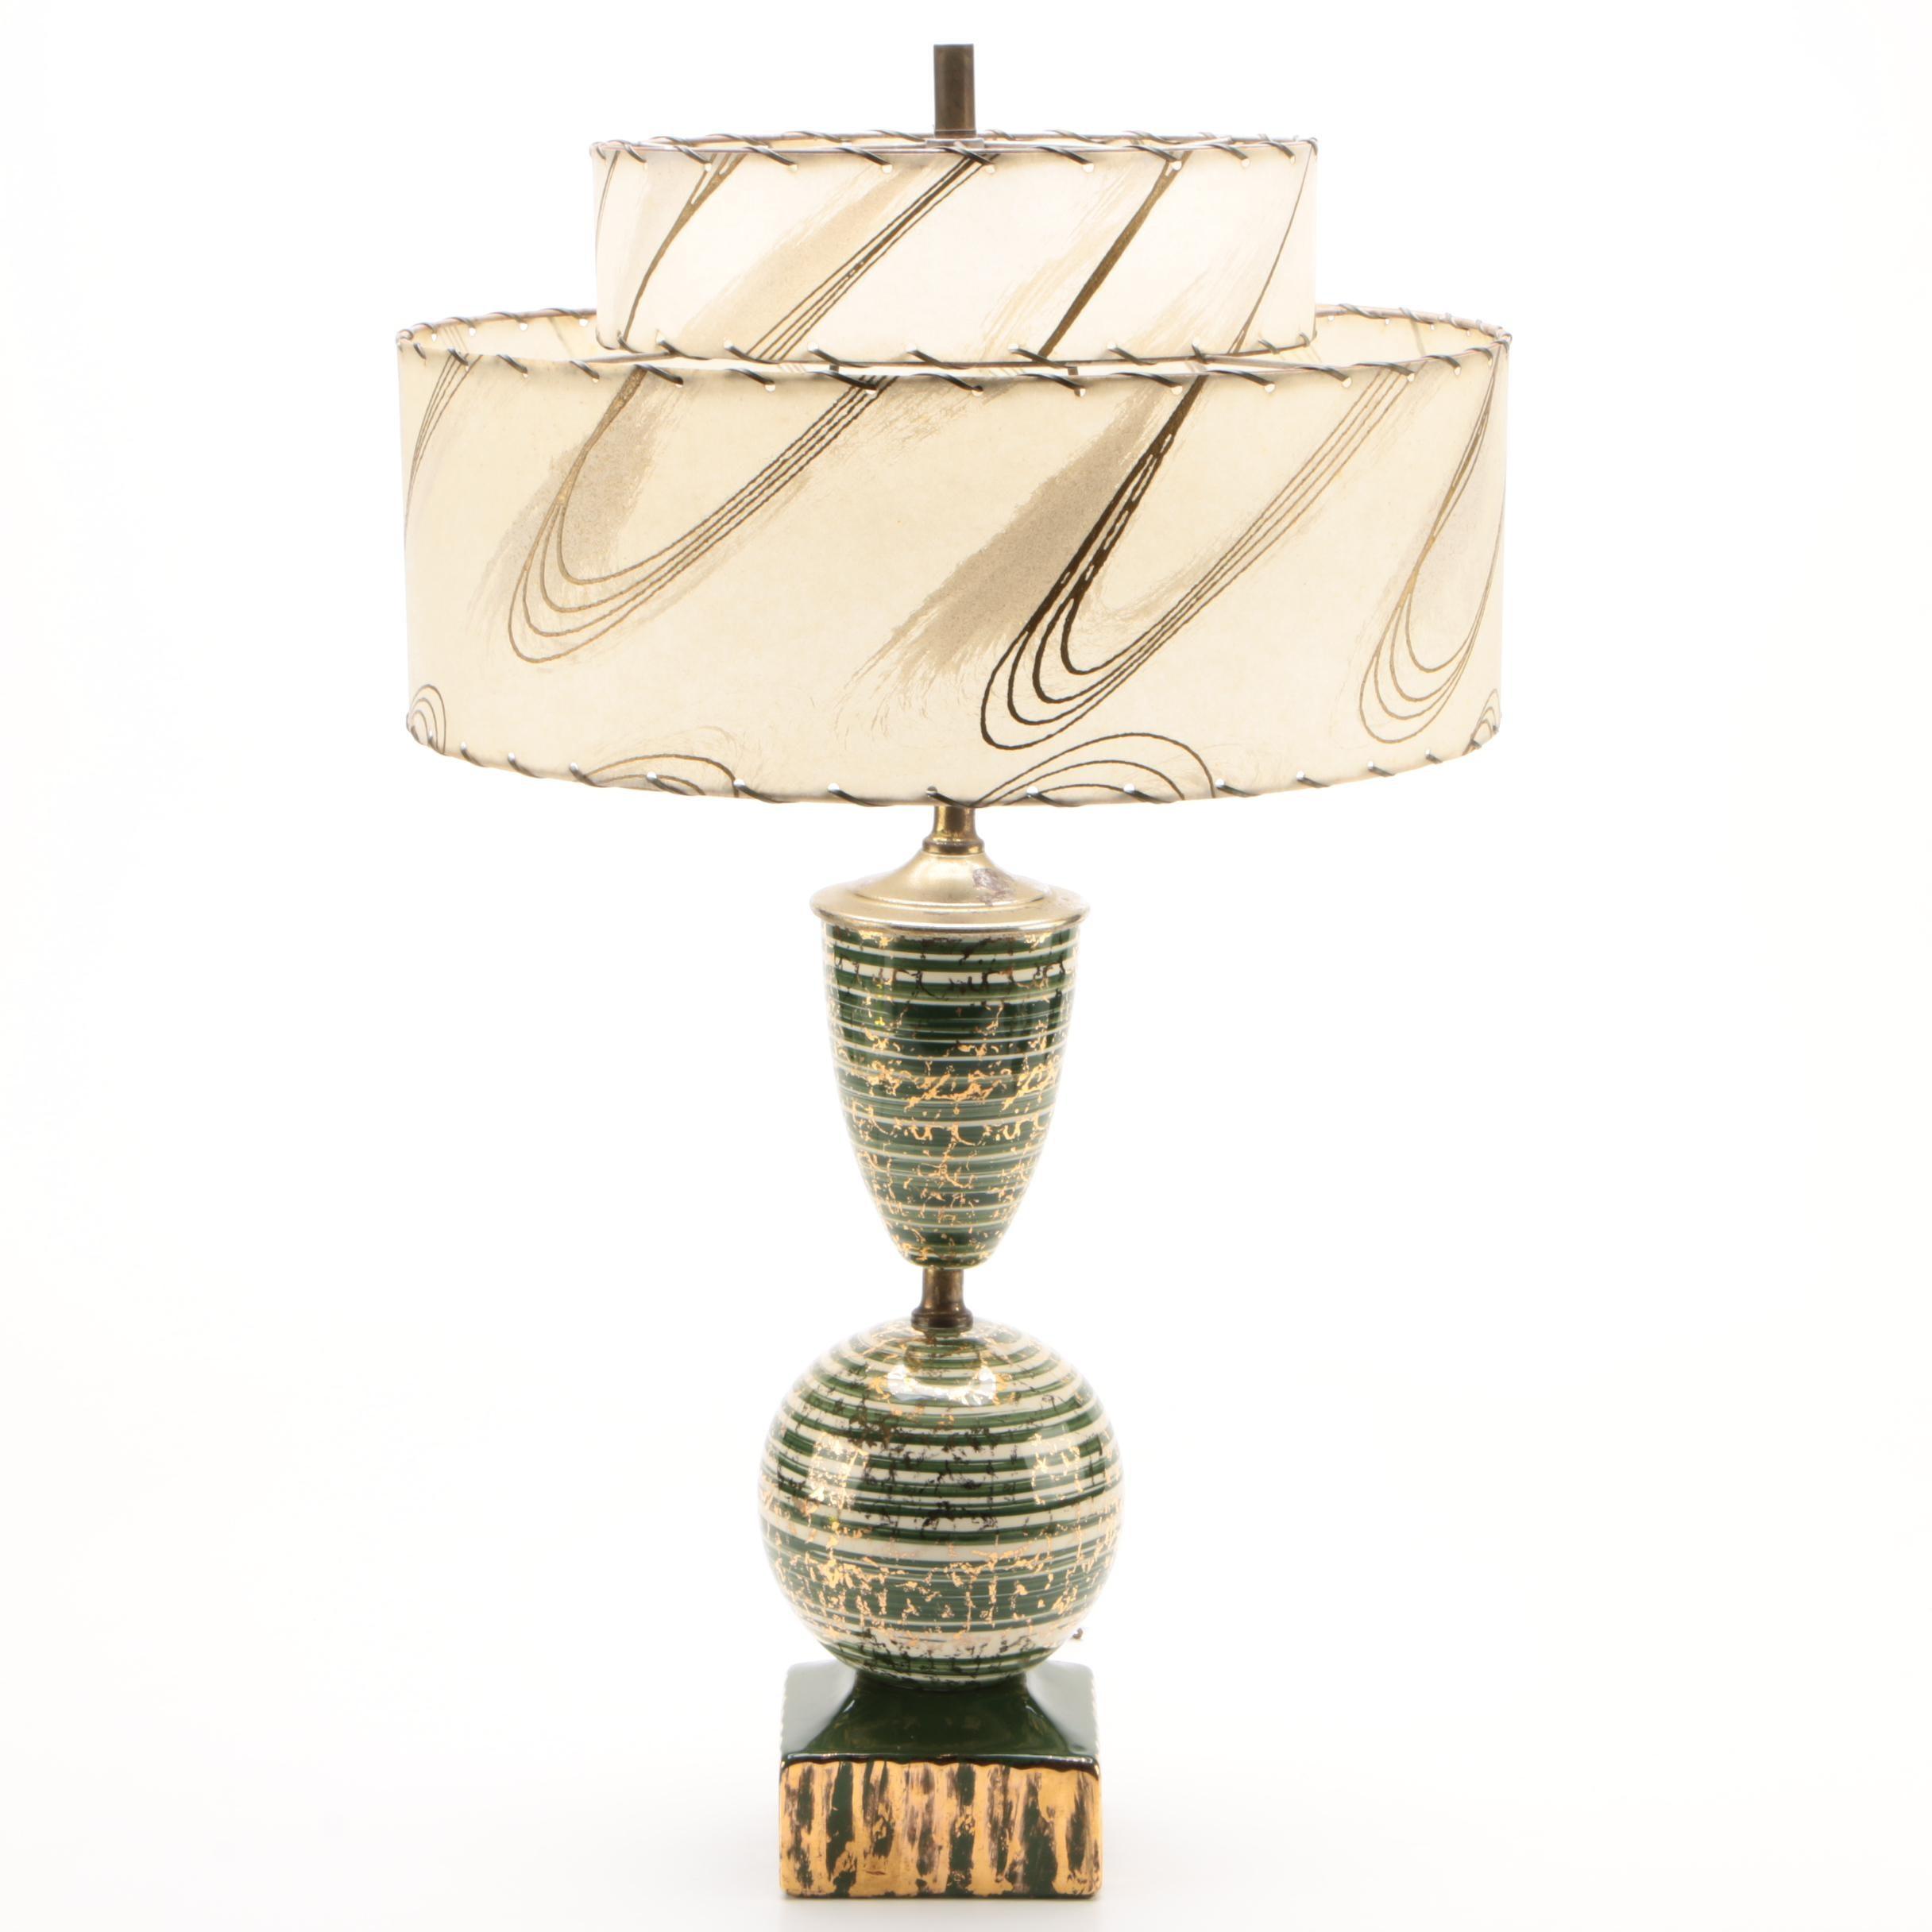 Mid Century Modern Ceramic Table Lamp with Fiberglass Shade